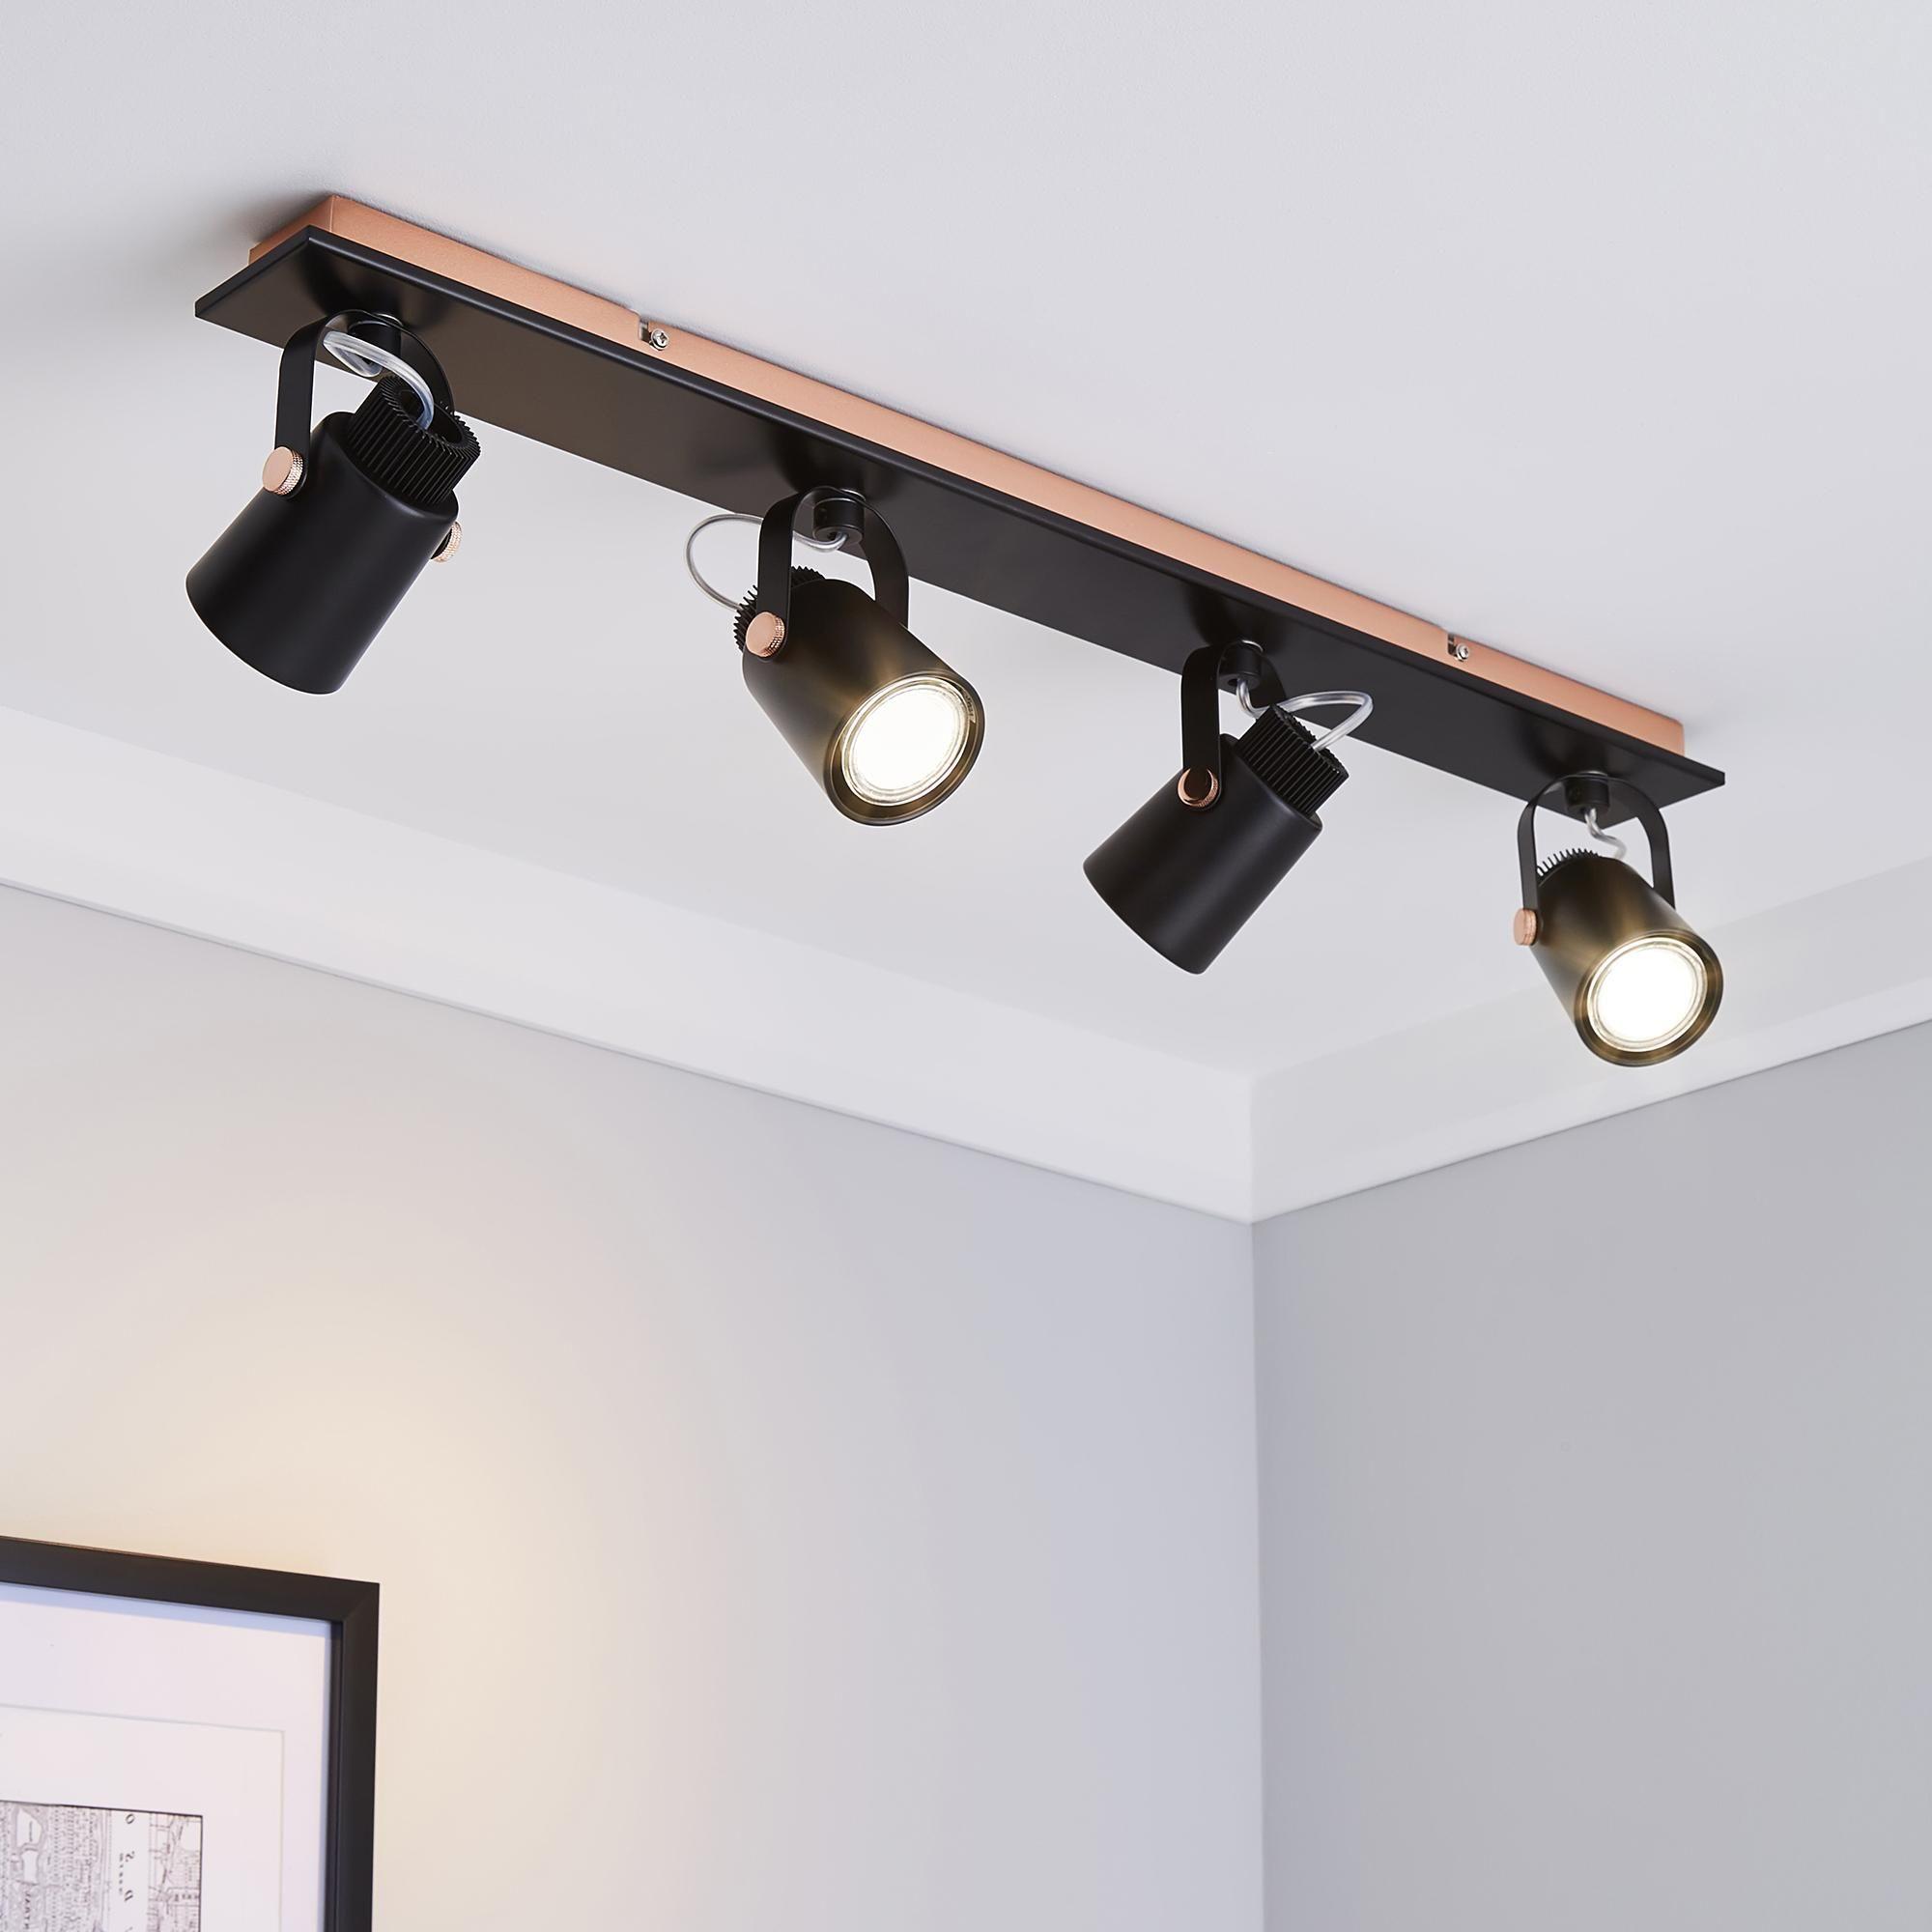 Black and Copper Lighting Collection 1 Light Adjustable Head Steel GU10 Spotlight